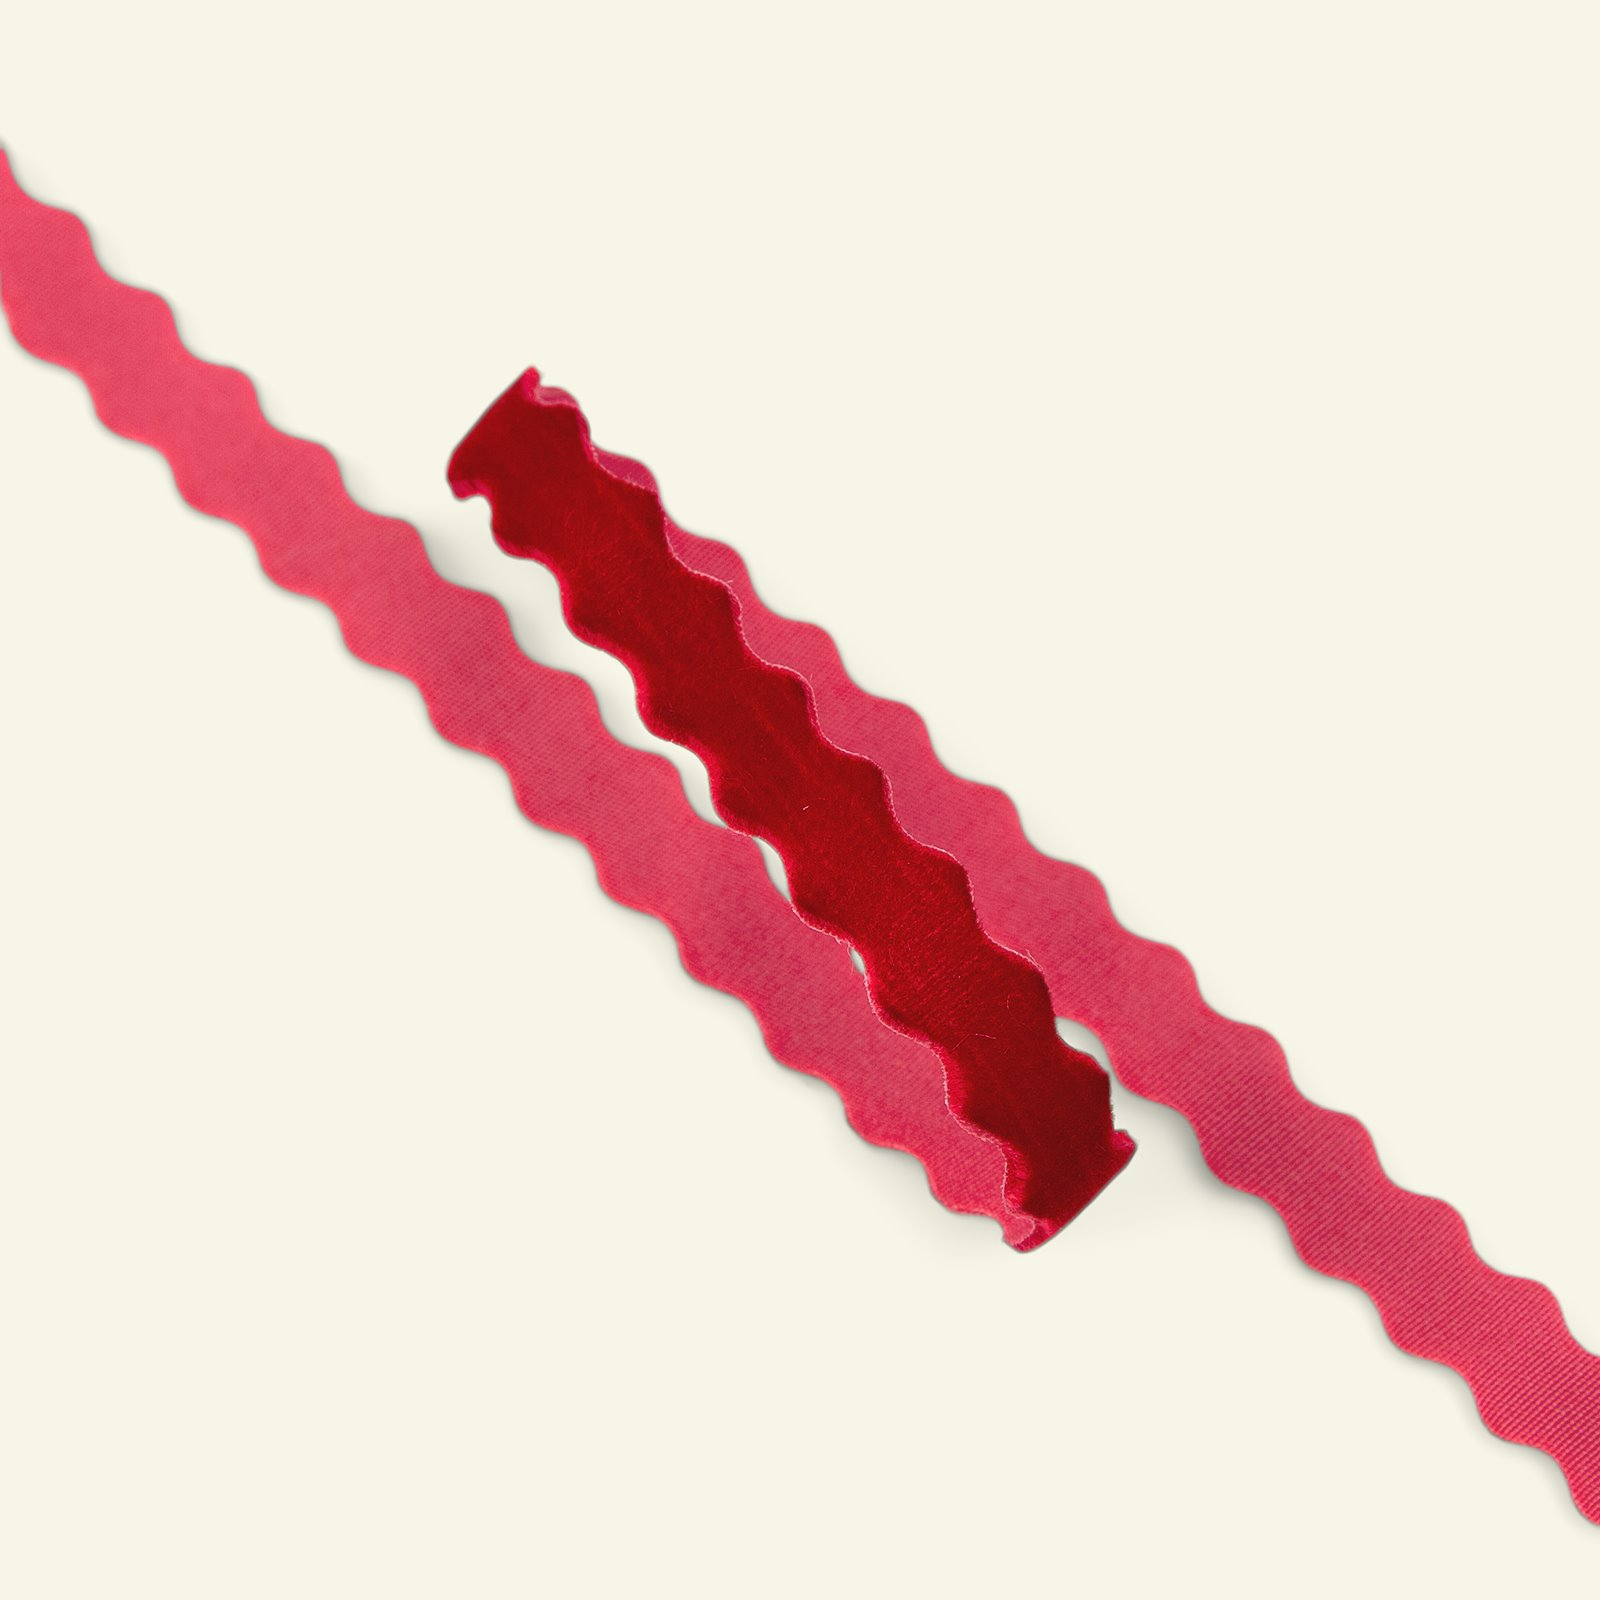 Ric rac velour ribbon 10mm red 2m 22213_pack